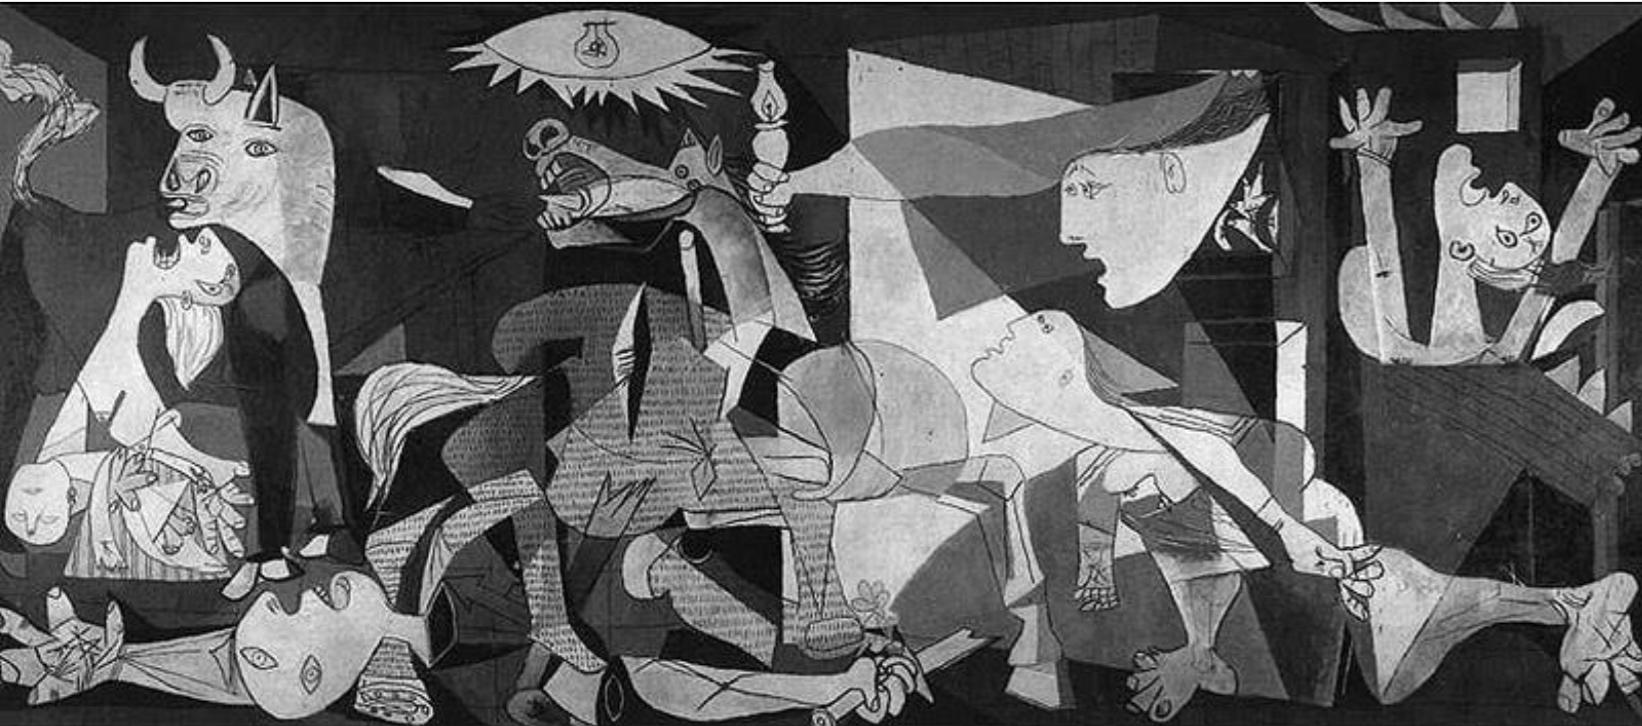 From Modernism to Postmodernism in Art by Dila Keles | Gallerymak